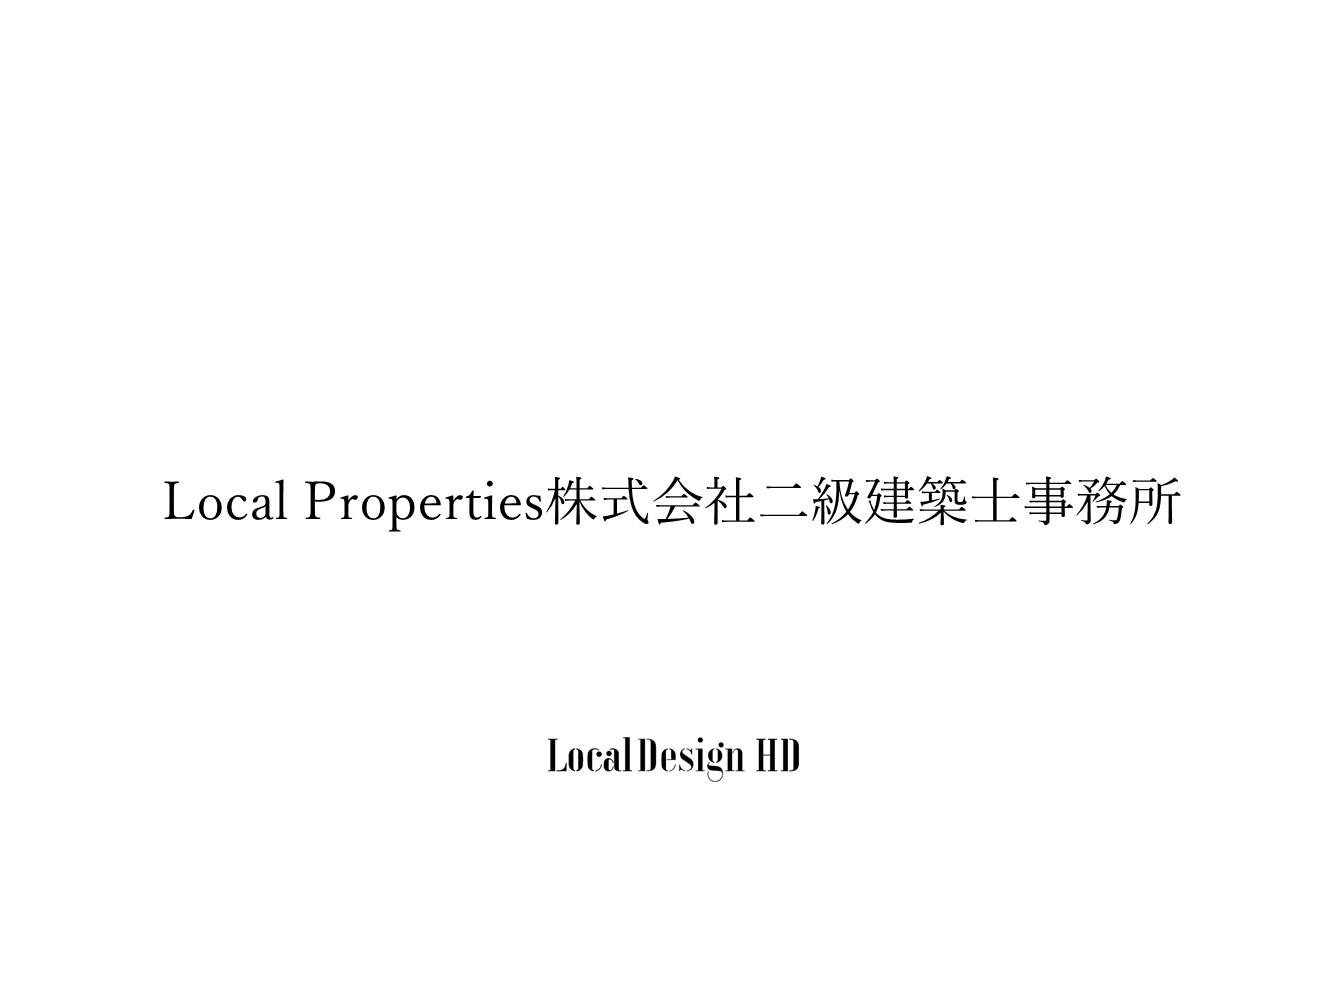 LP二級建築士事務所